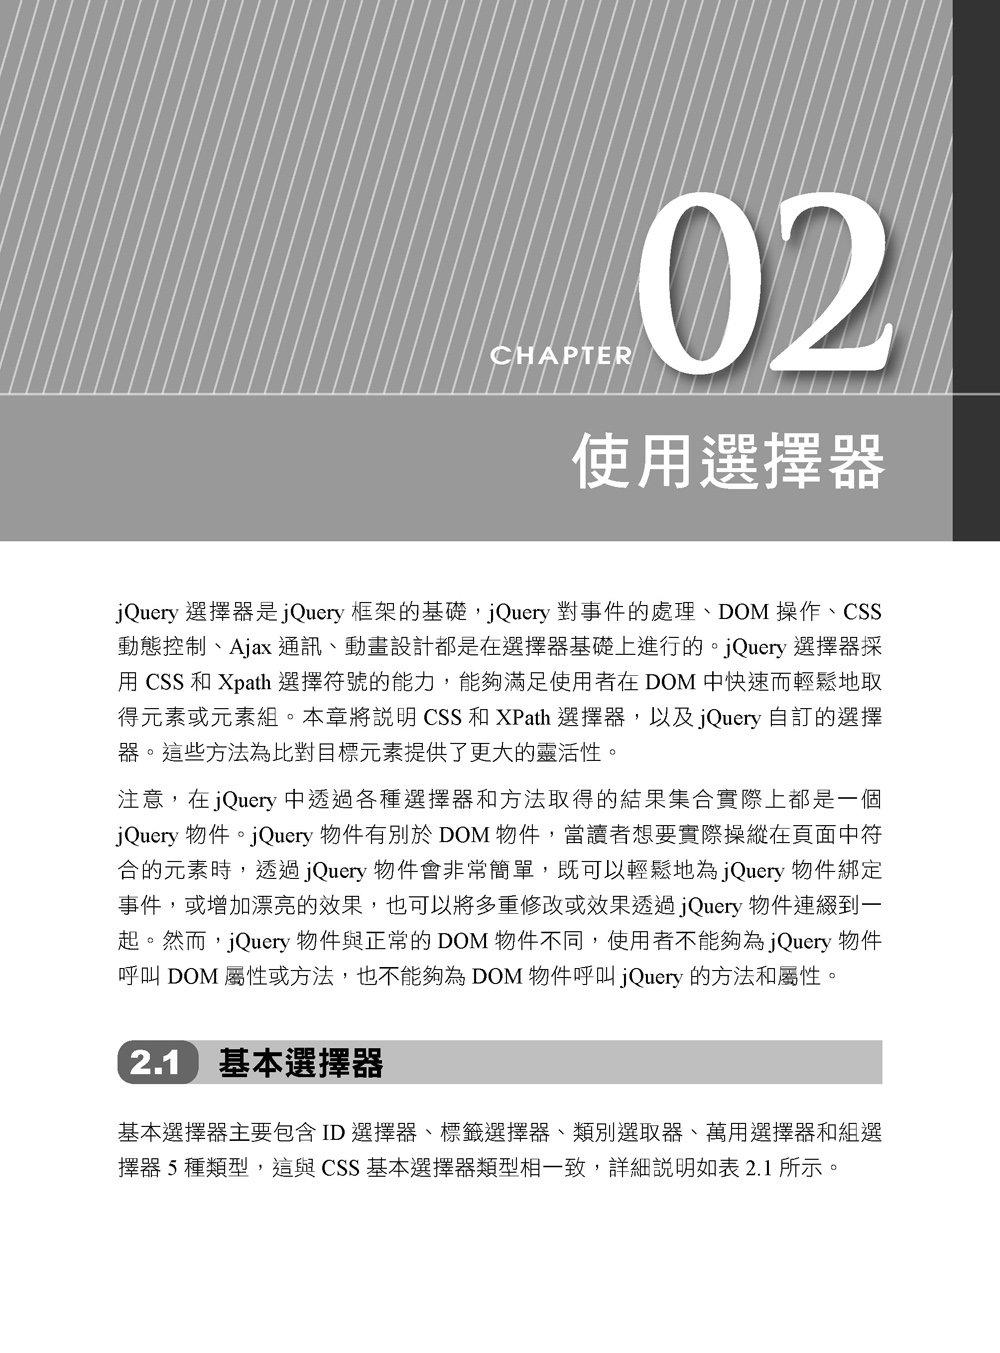 JQuery 從入門到實戰之路 (舊名: 王者歸來 : jQuery開發權威指南)-preview-11